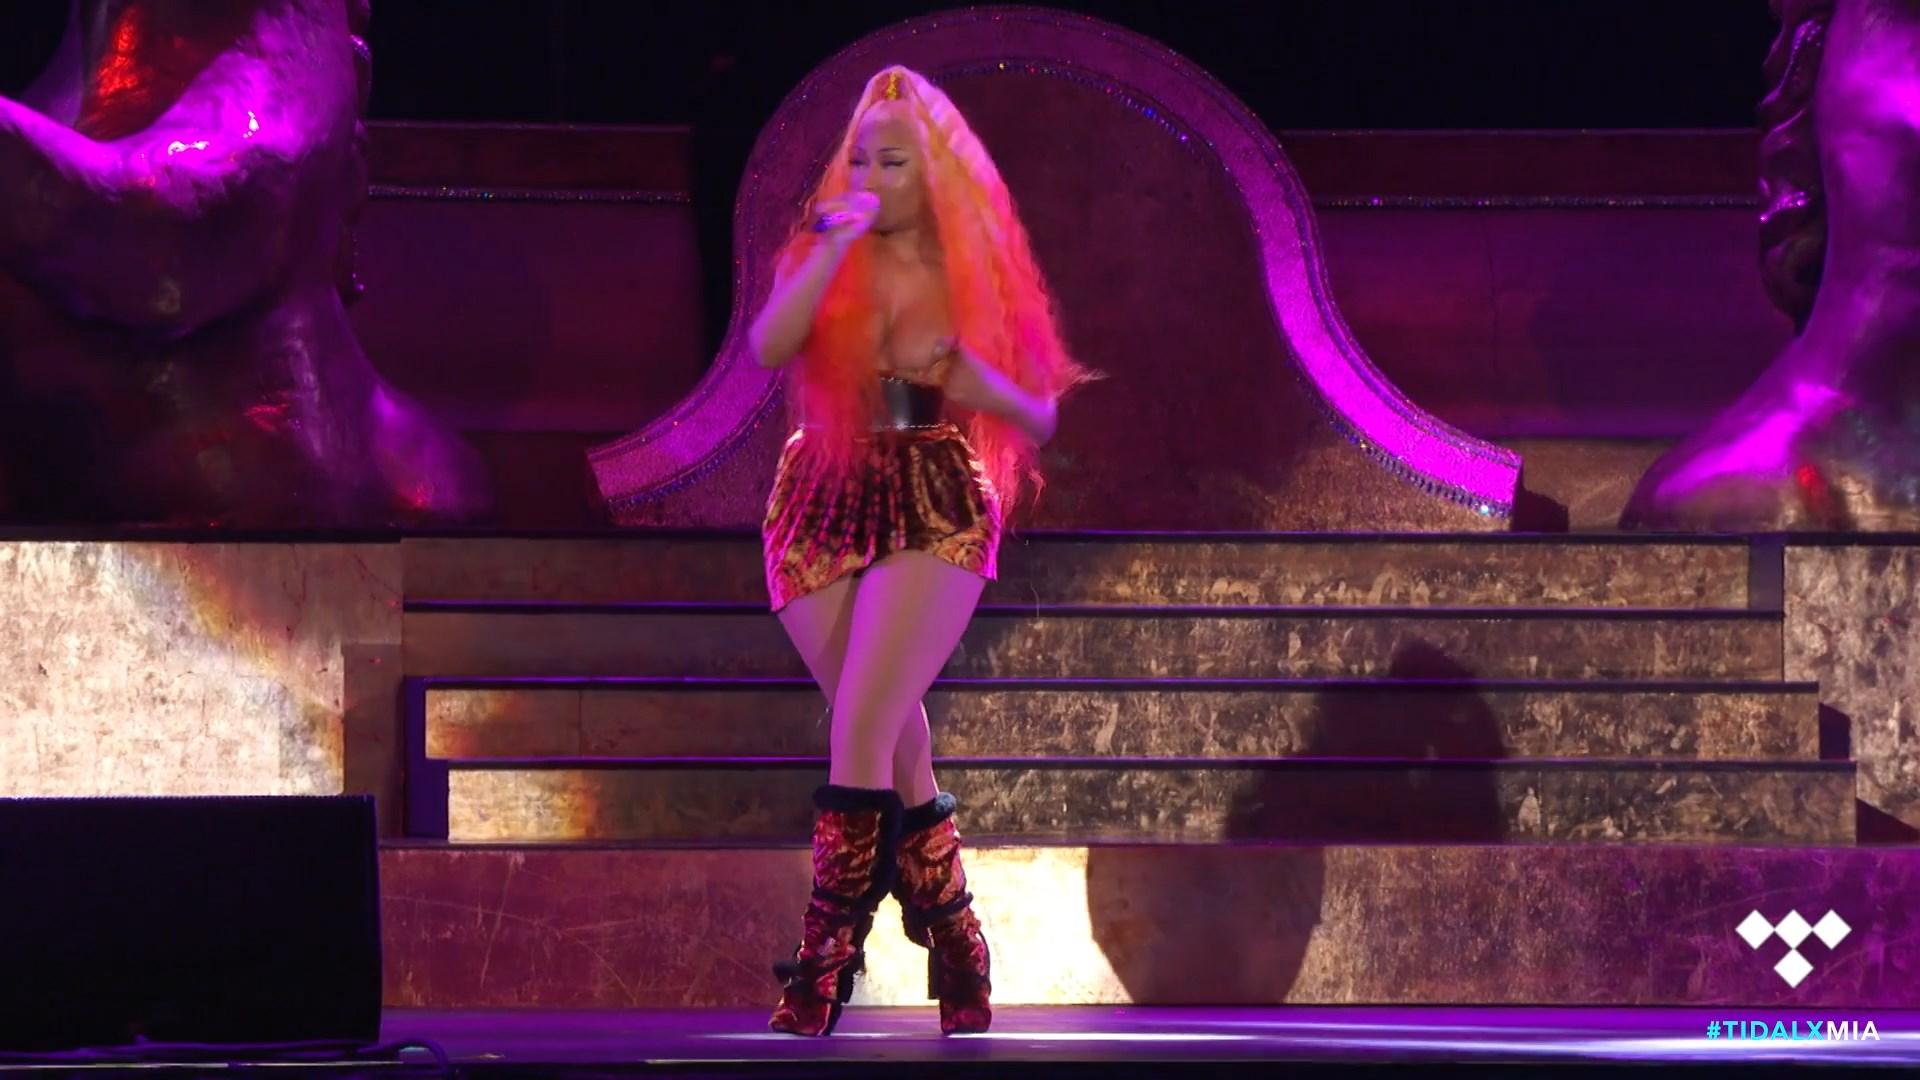 Nicki-Minaj-Nude-TheFappeningBlog.com-13.jpg